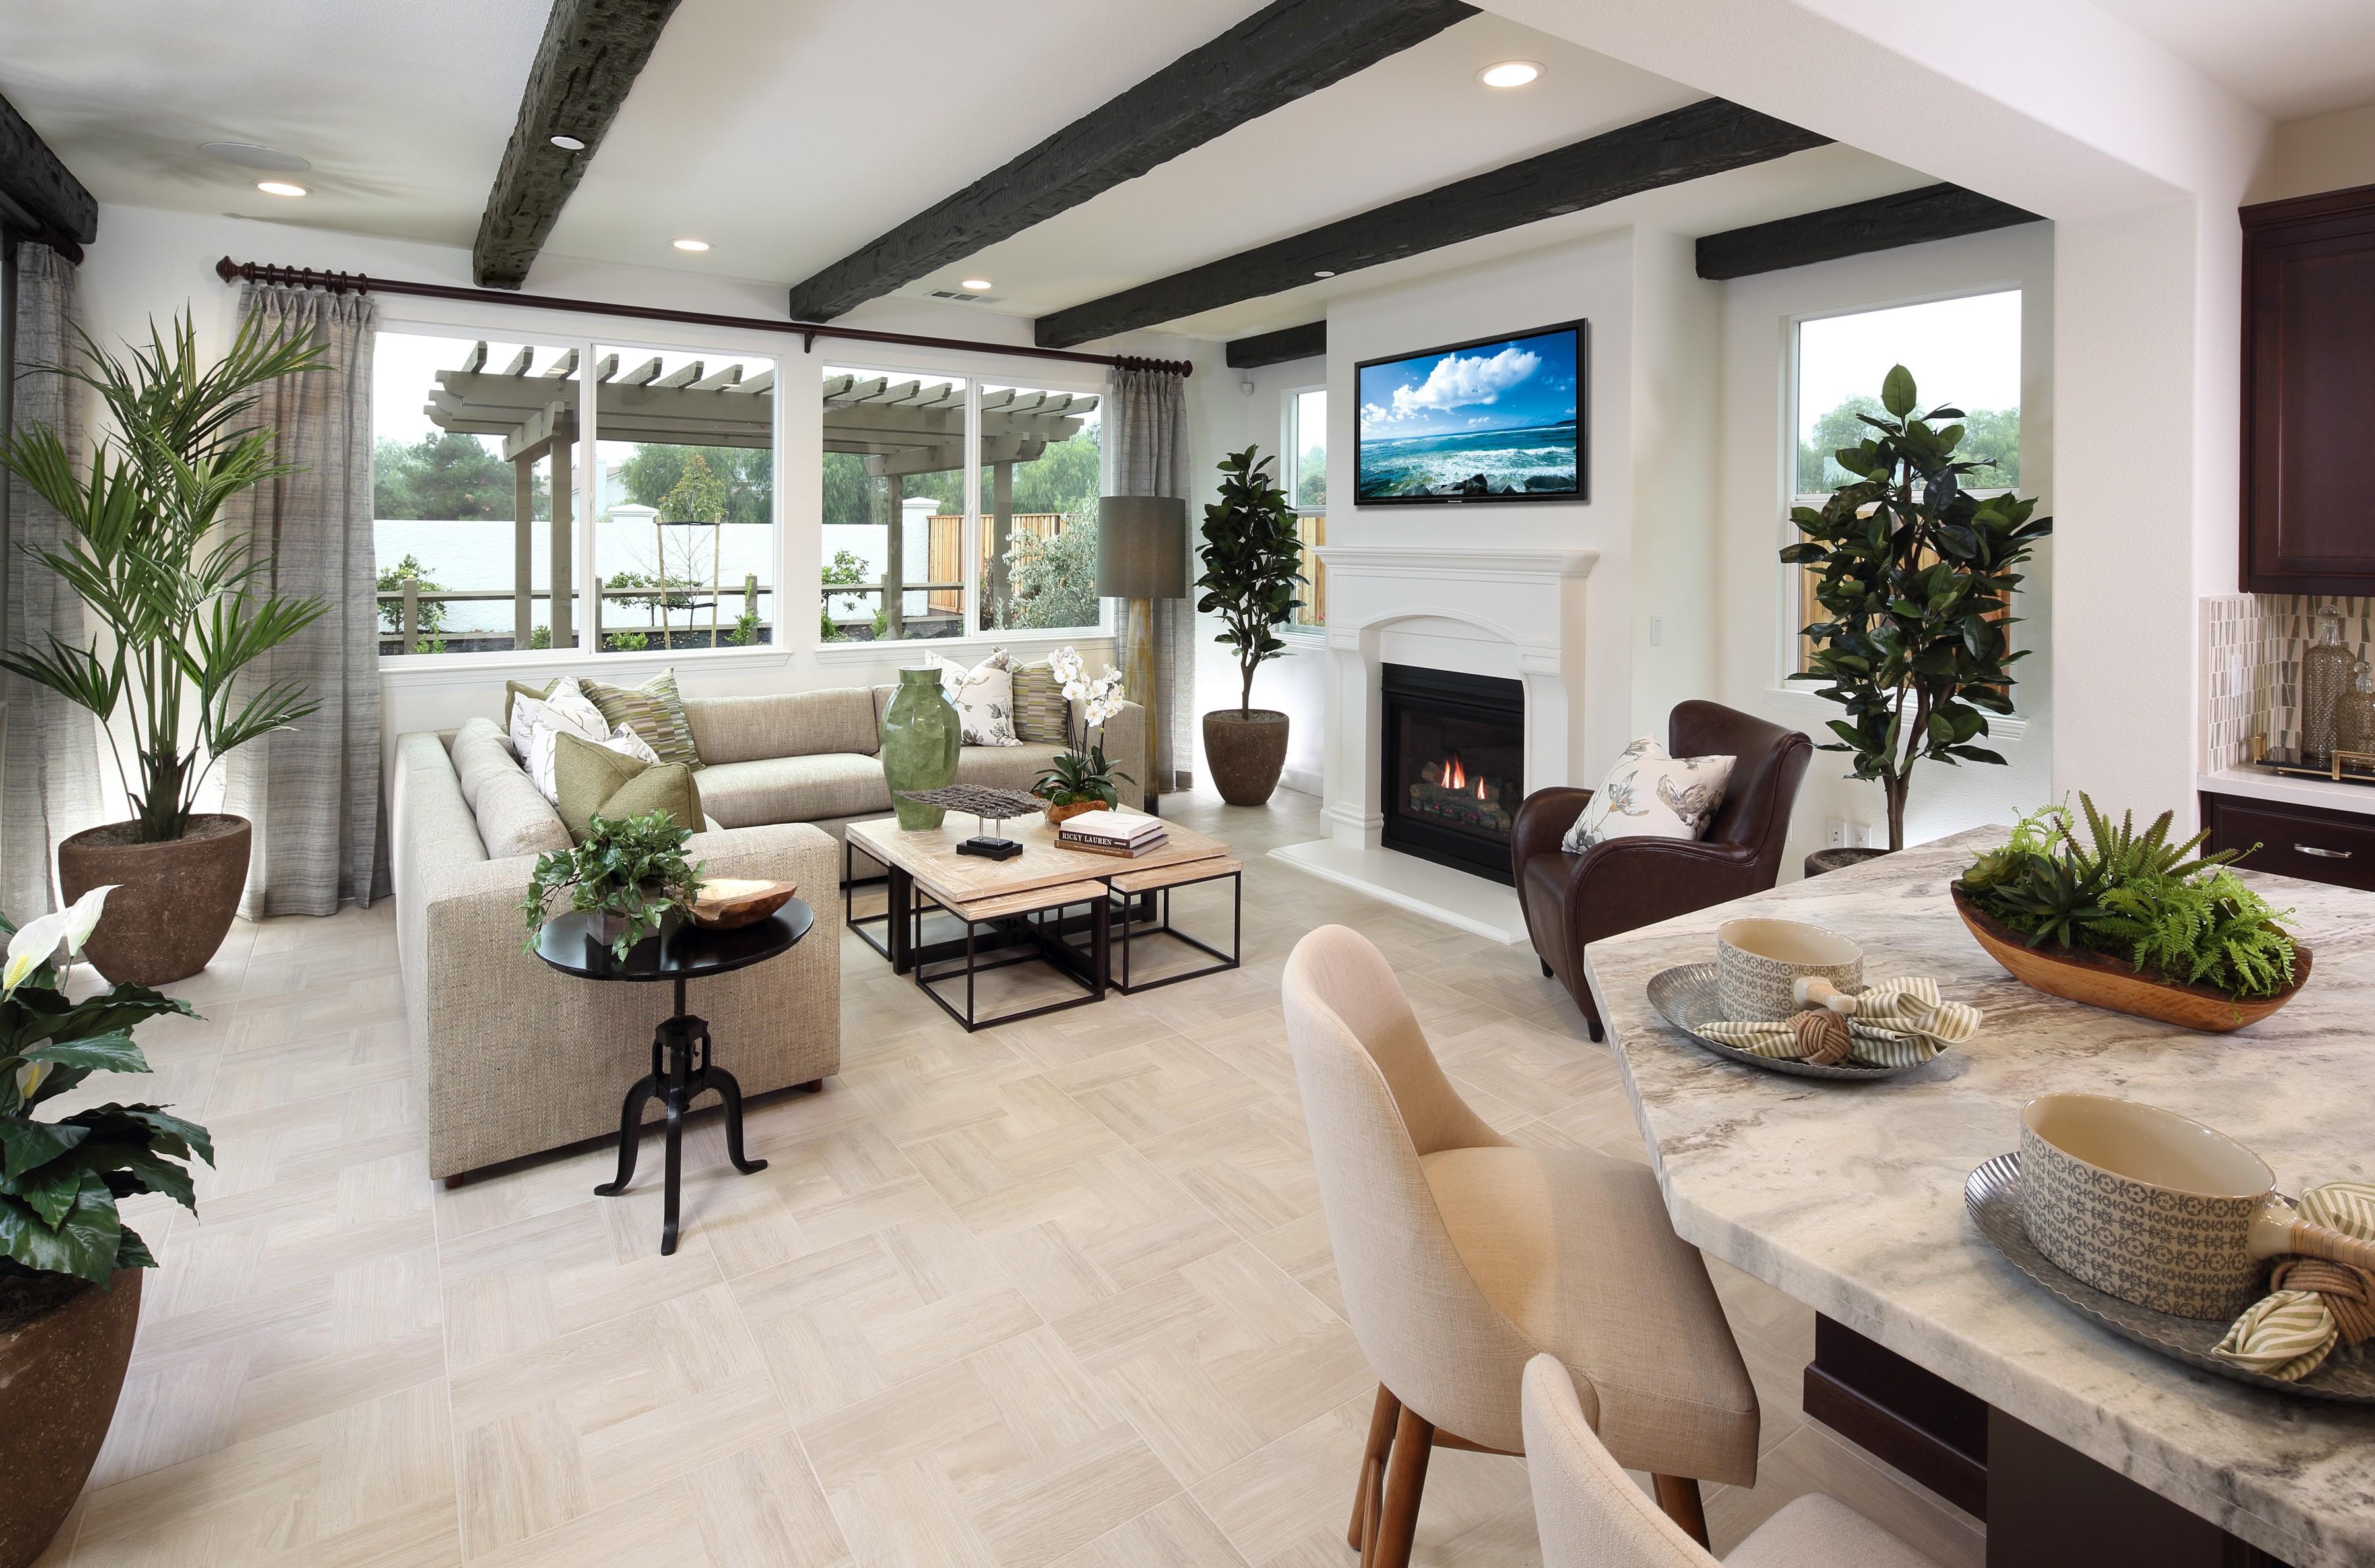 Interior design   Elite Builder Services